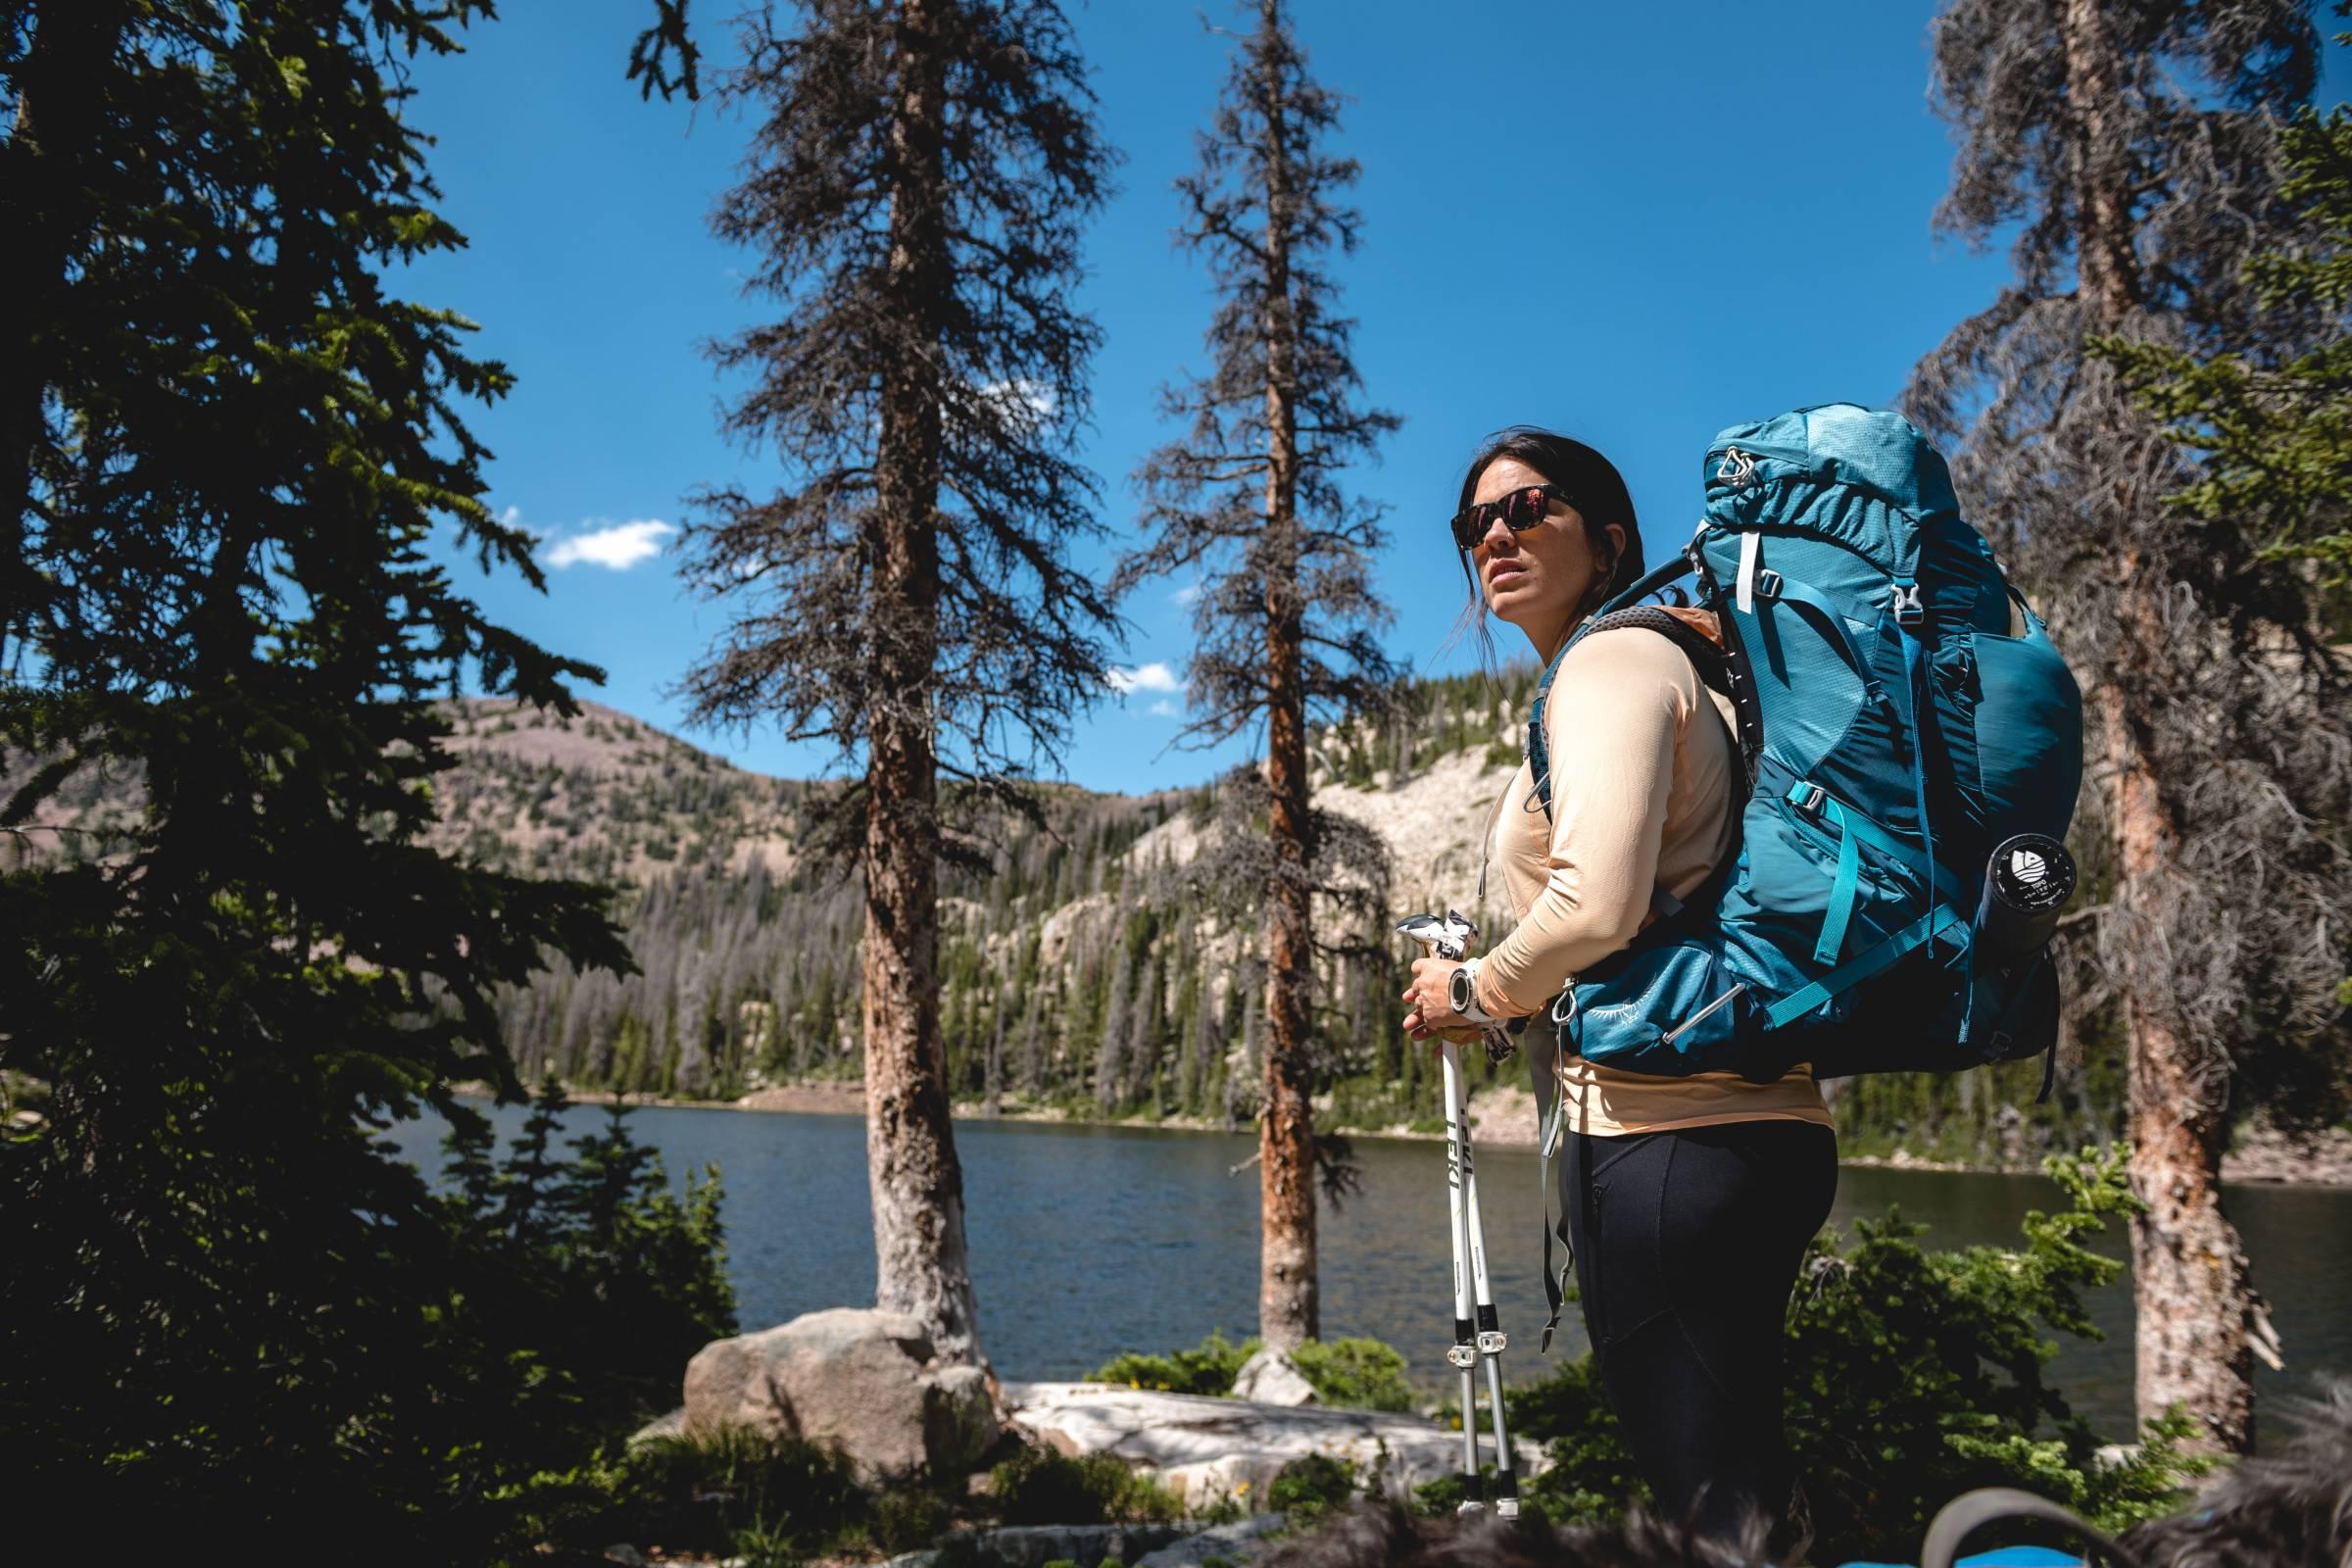 backcountry-lifestyle-hiking-woman